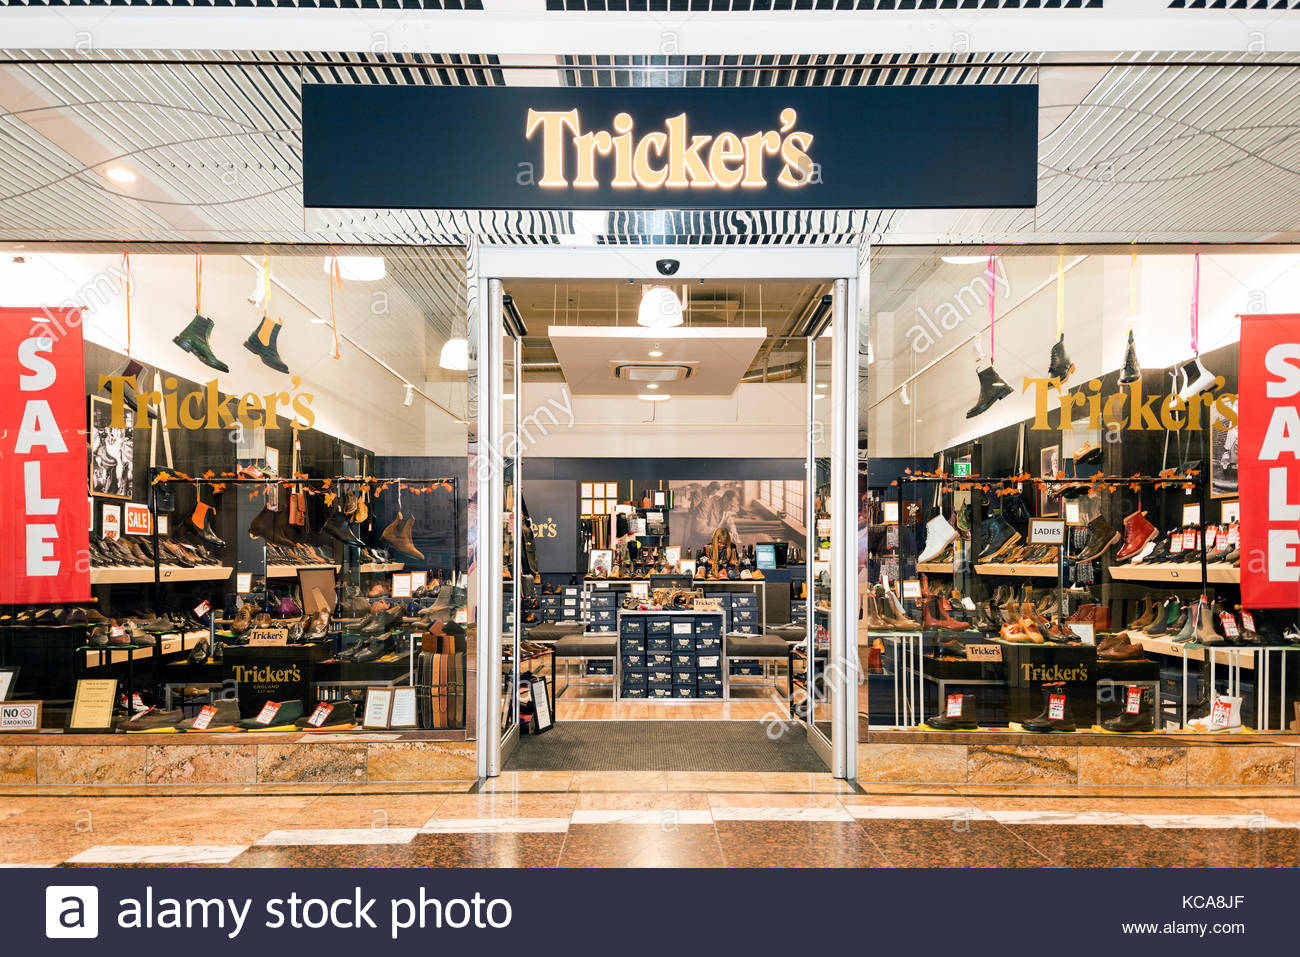 tricker 39 s shoes store uk stock photo 162495495 alamy. Black Bedroom Furniture Sets. Home Design Ideas